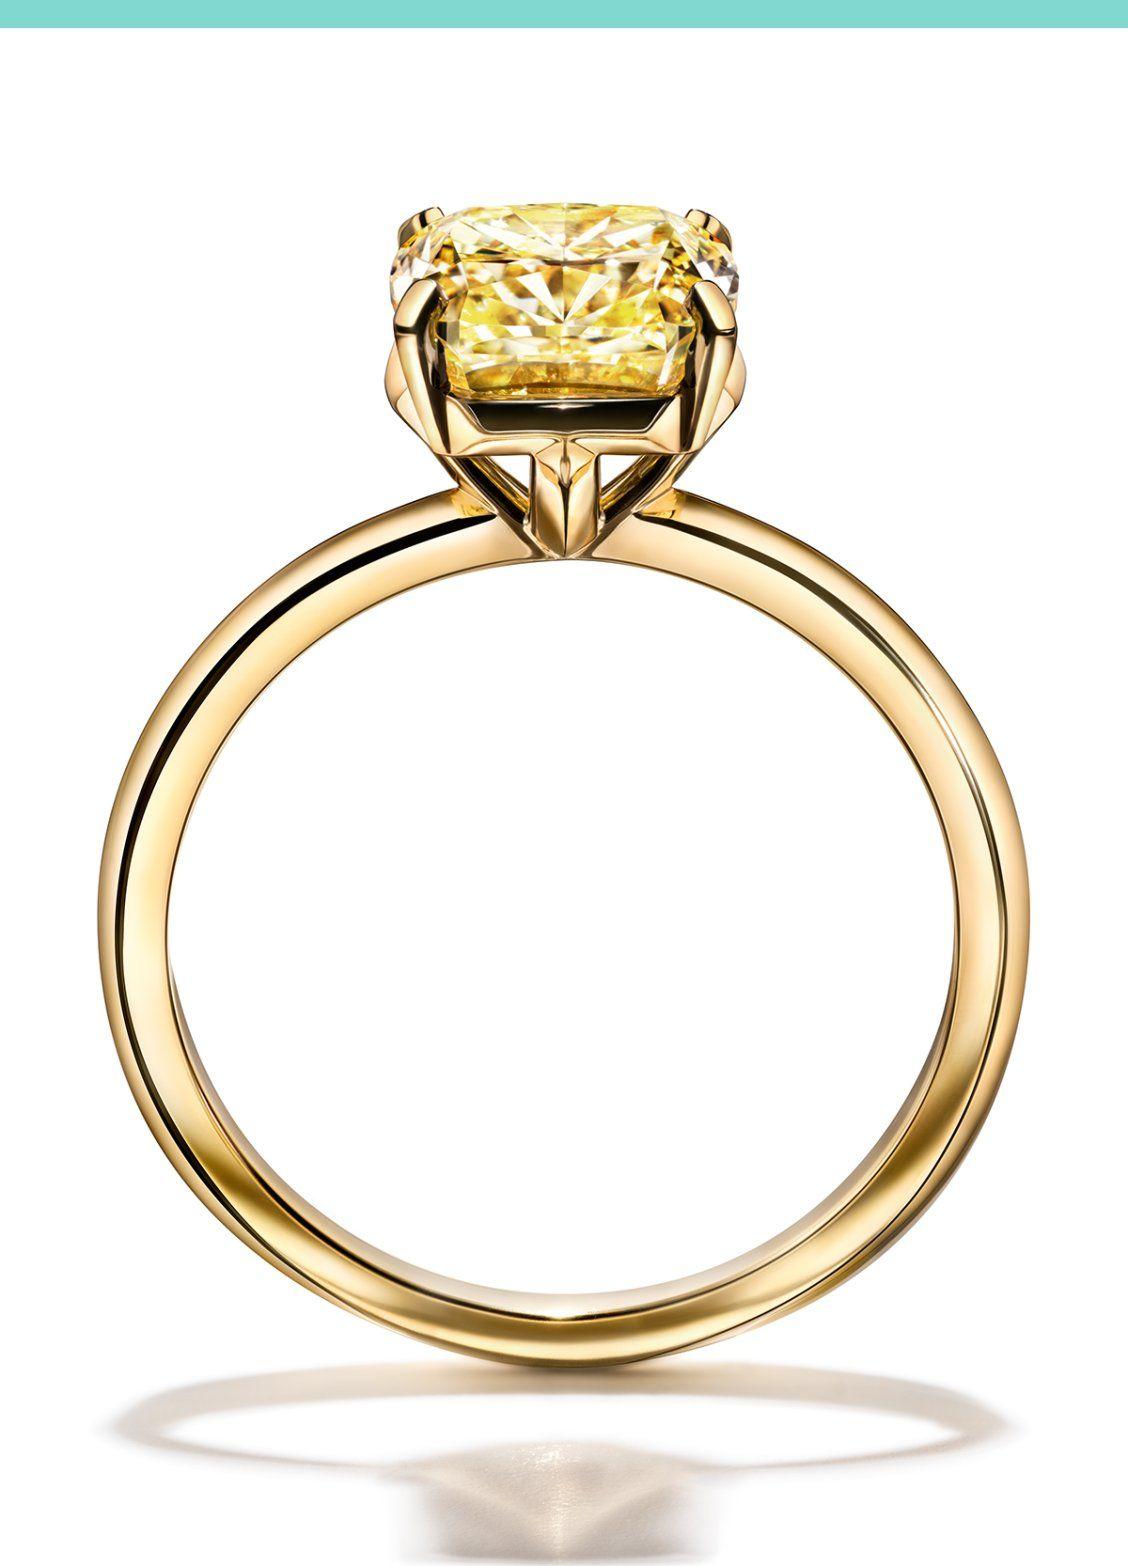 Tiffany True Engagement Ring Tiffany Engagement Ring Engagement Earrings Engagement Rings